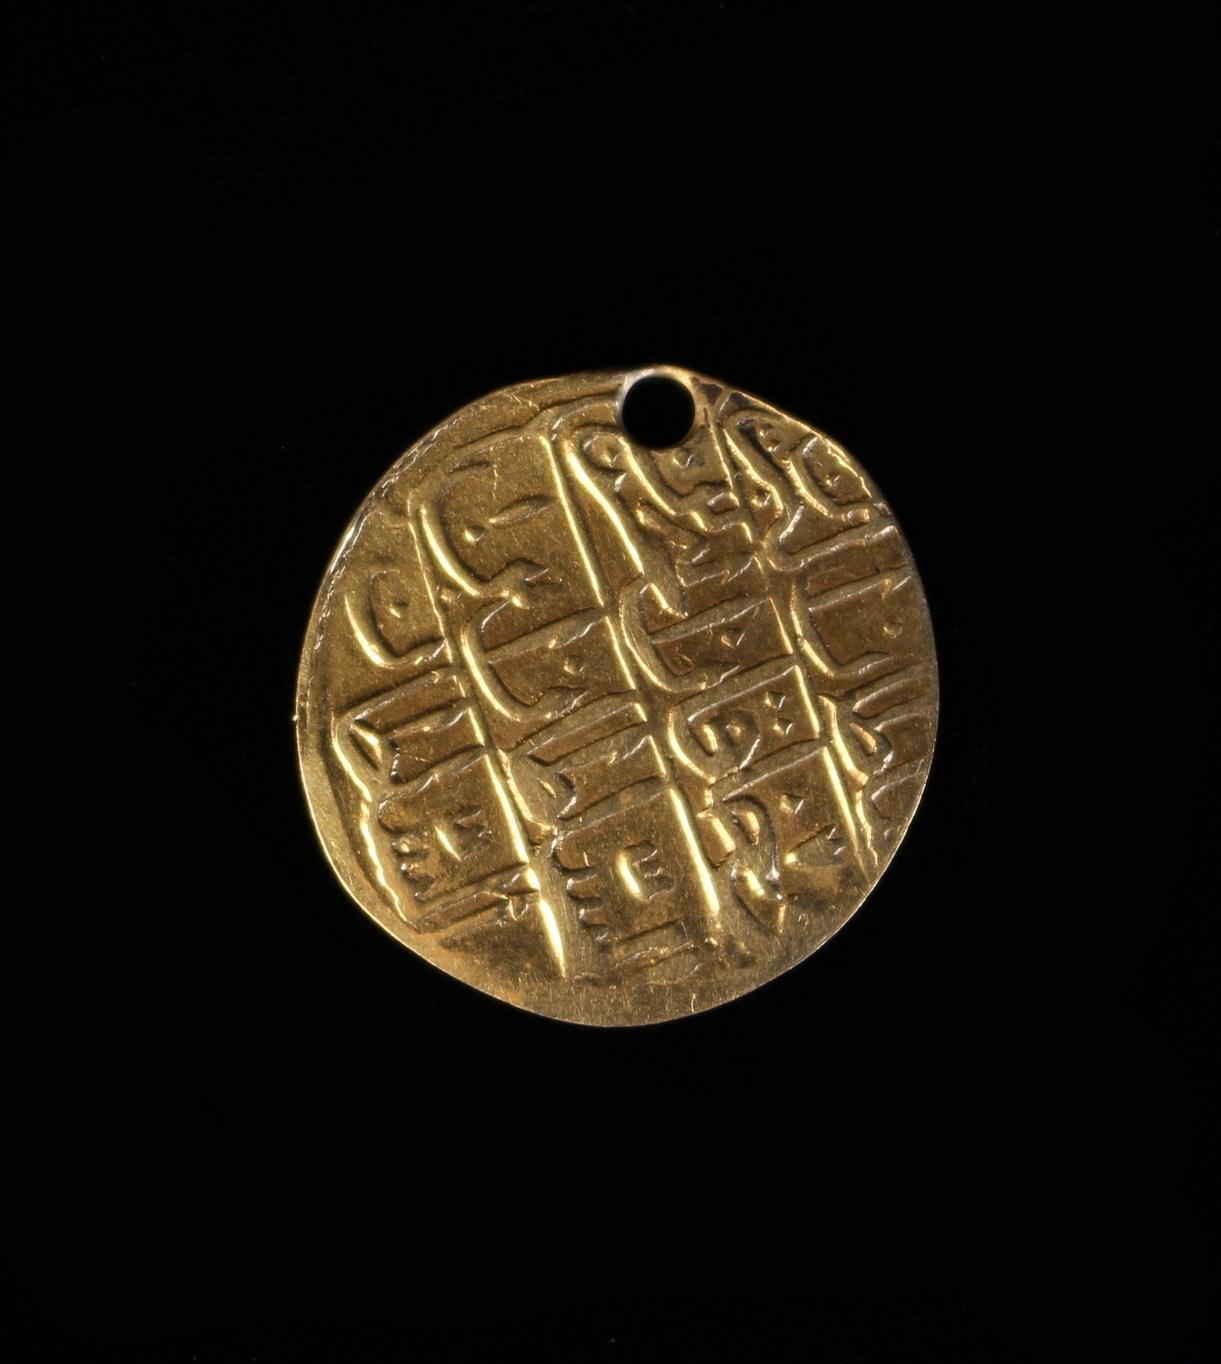 A 1720's Turkish Ottoman Empire Selina III Gold ½ Zeri Mahbub. - Image 2 of 2